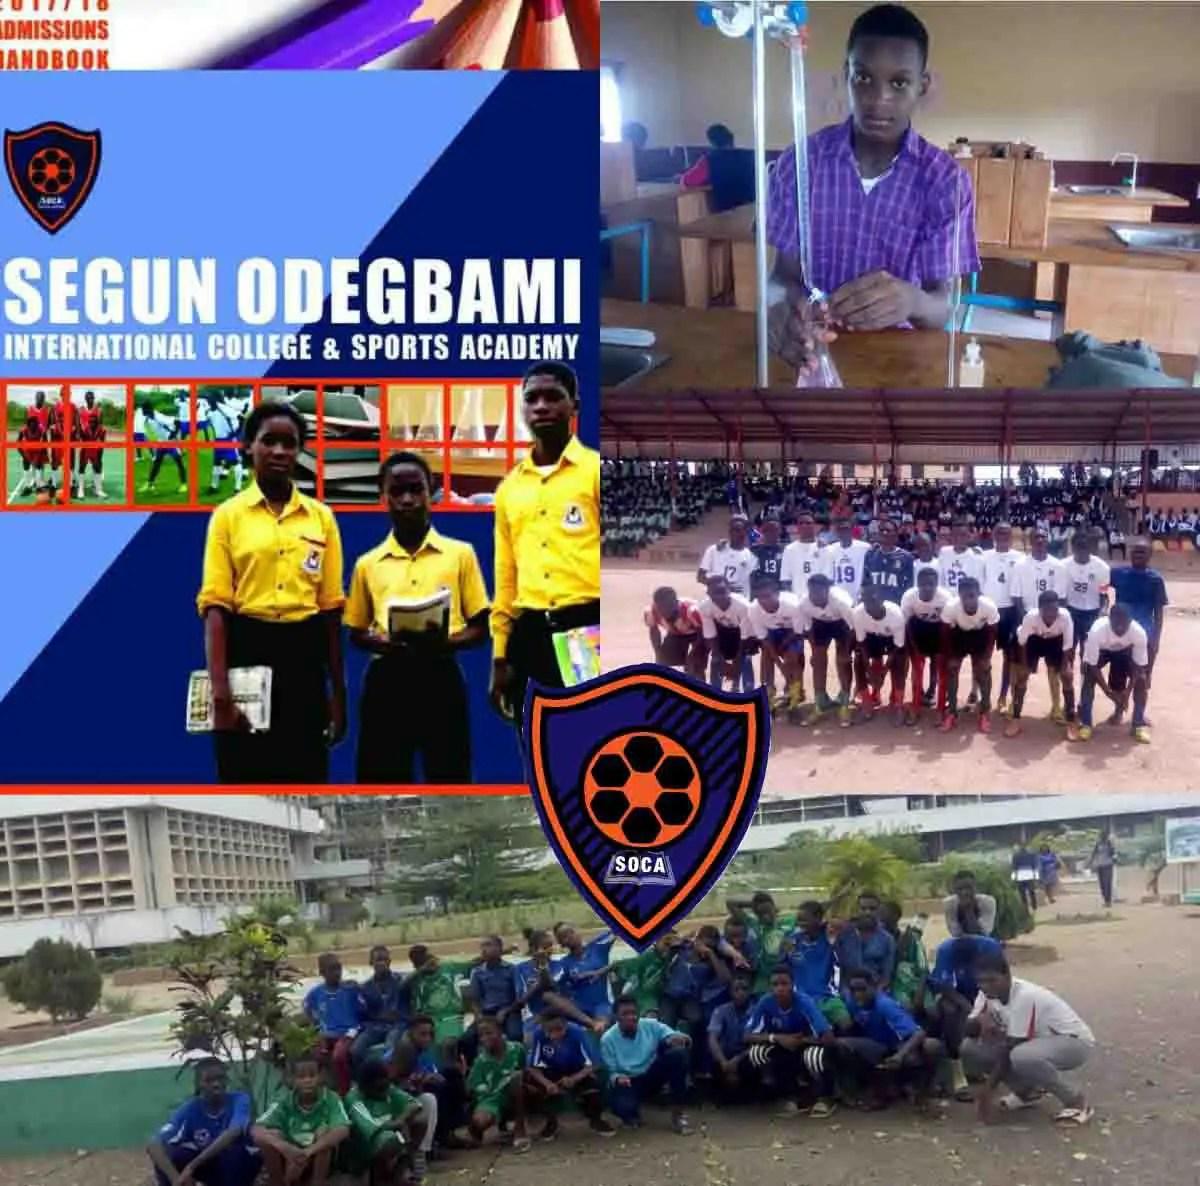 Odegbami: He Is A Breath Of Fresh Air